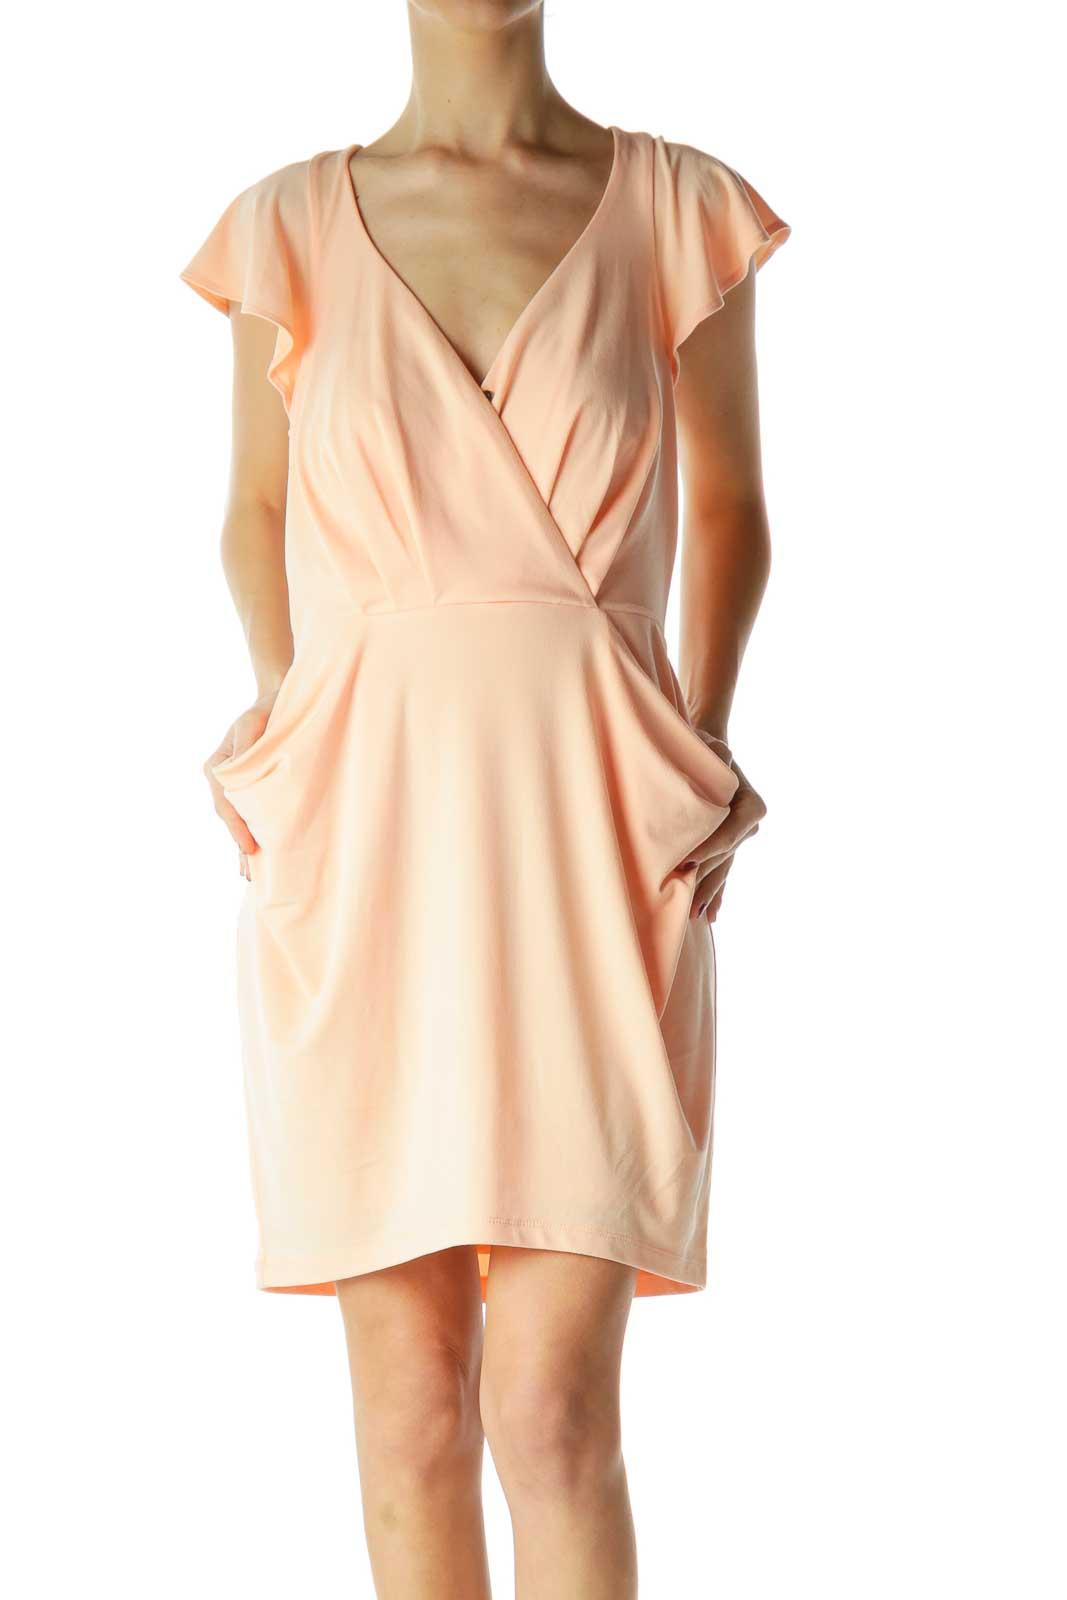 Orange Pocketed Surplice Cocktail Dress